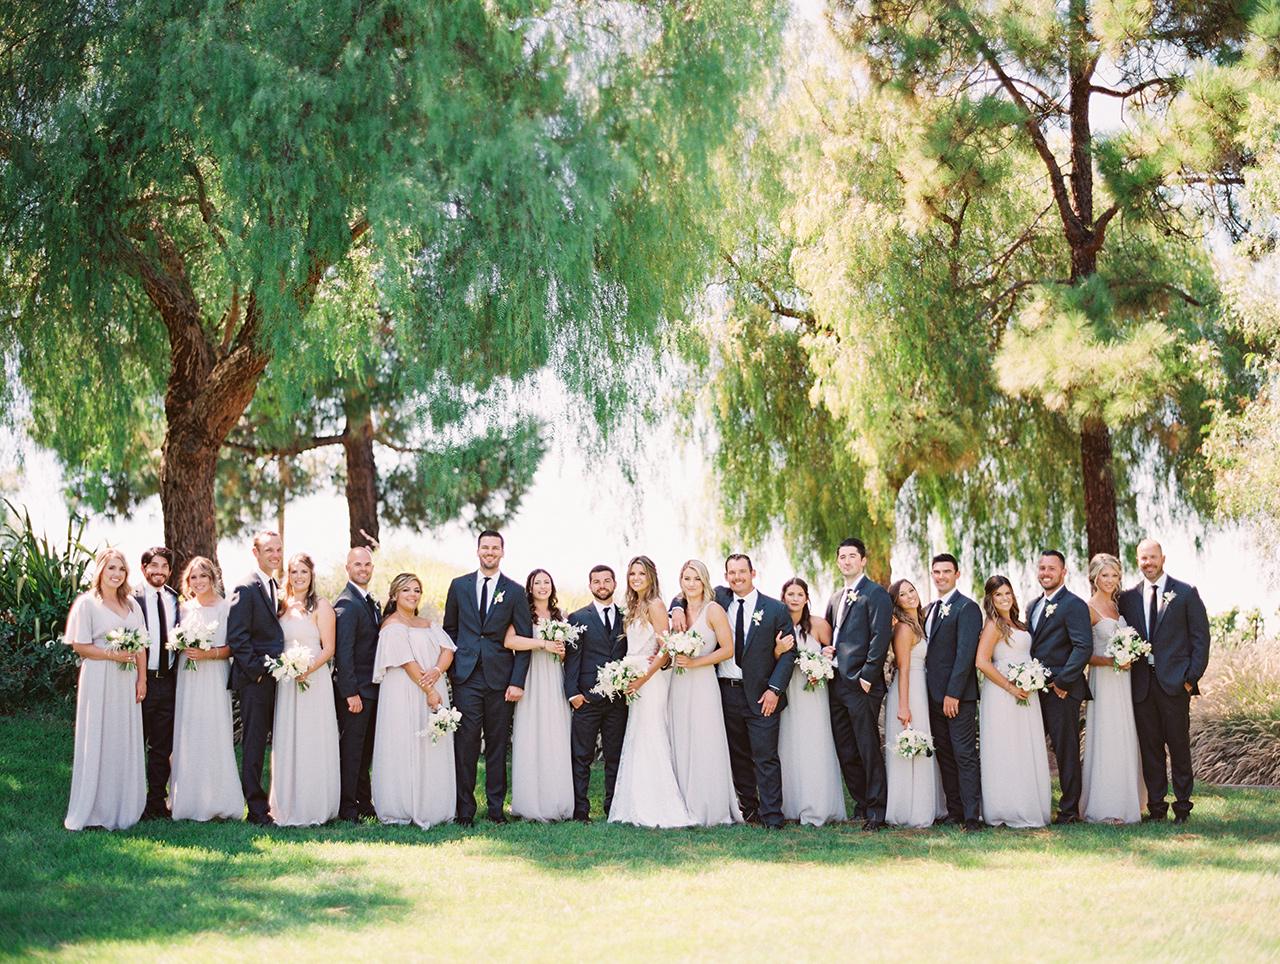 wedding party pale dresses dark gray tuxedos